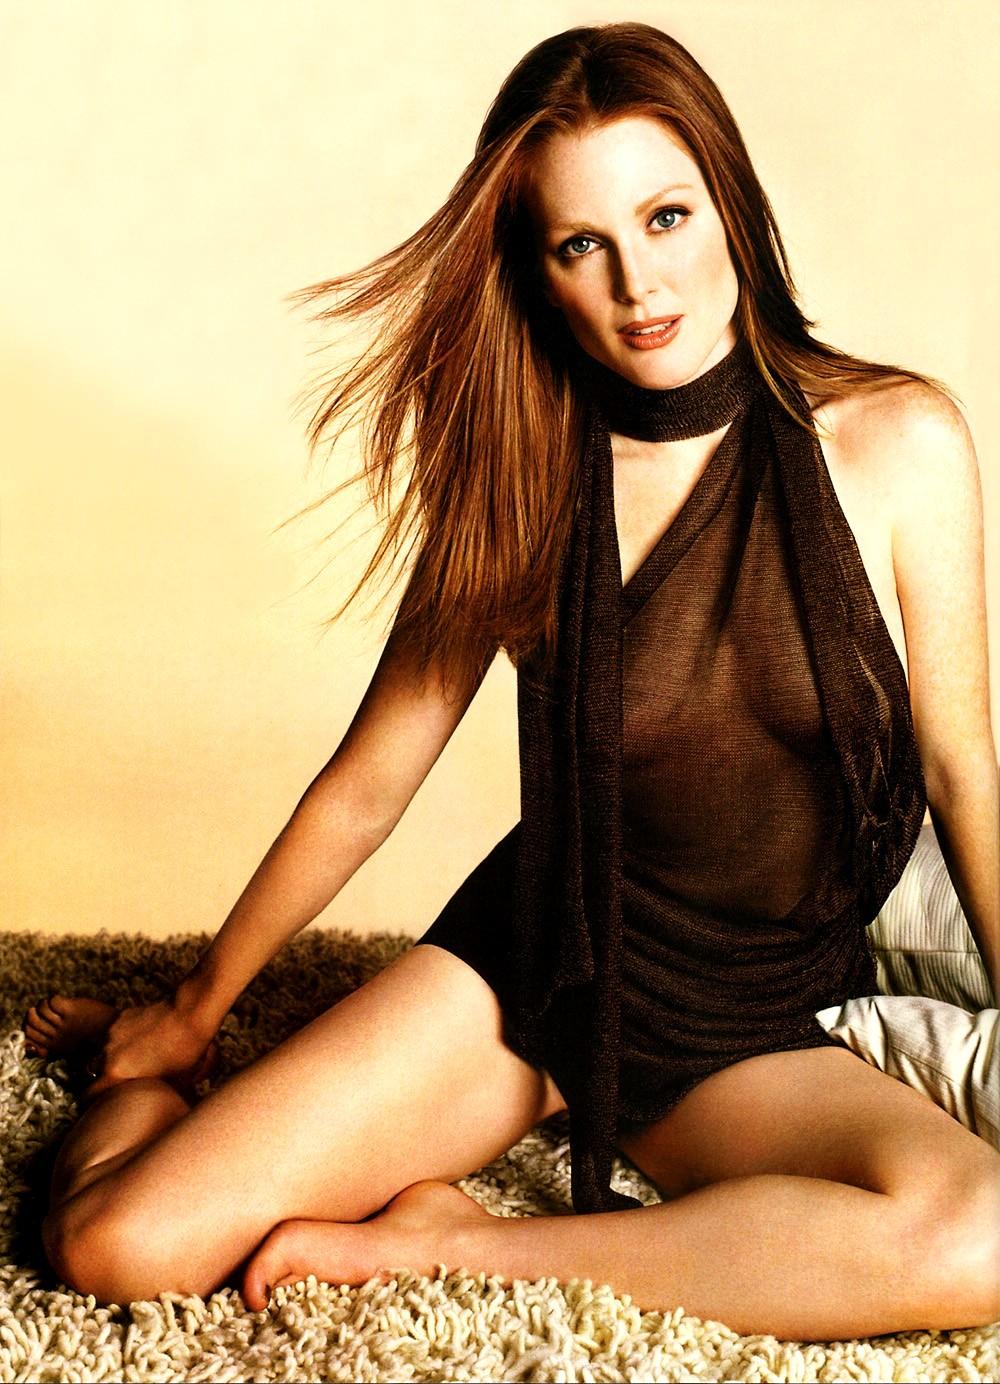 Anabel Cherubito Hot julianne moore | superstars galleries